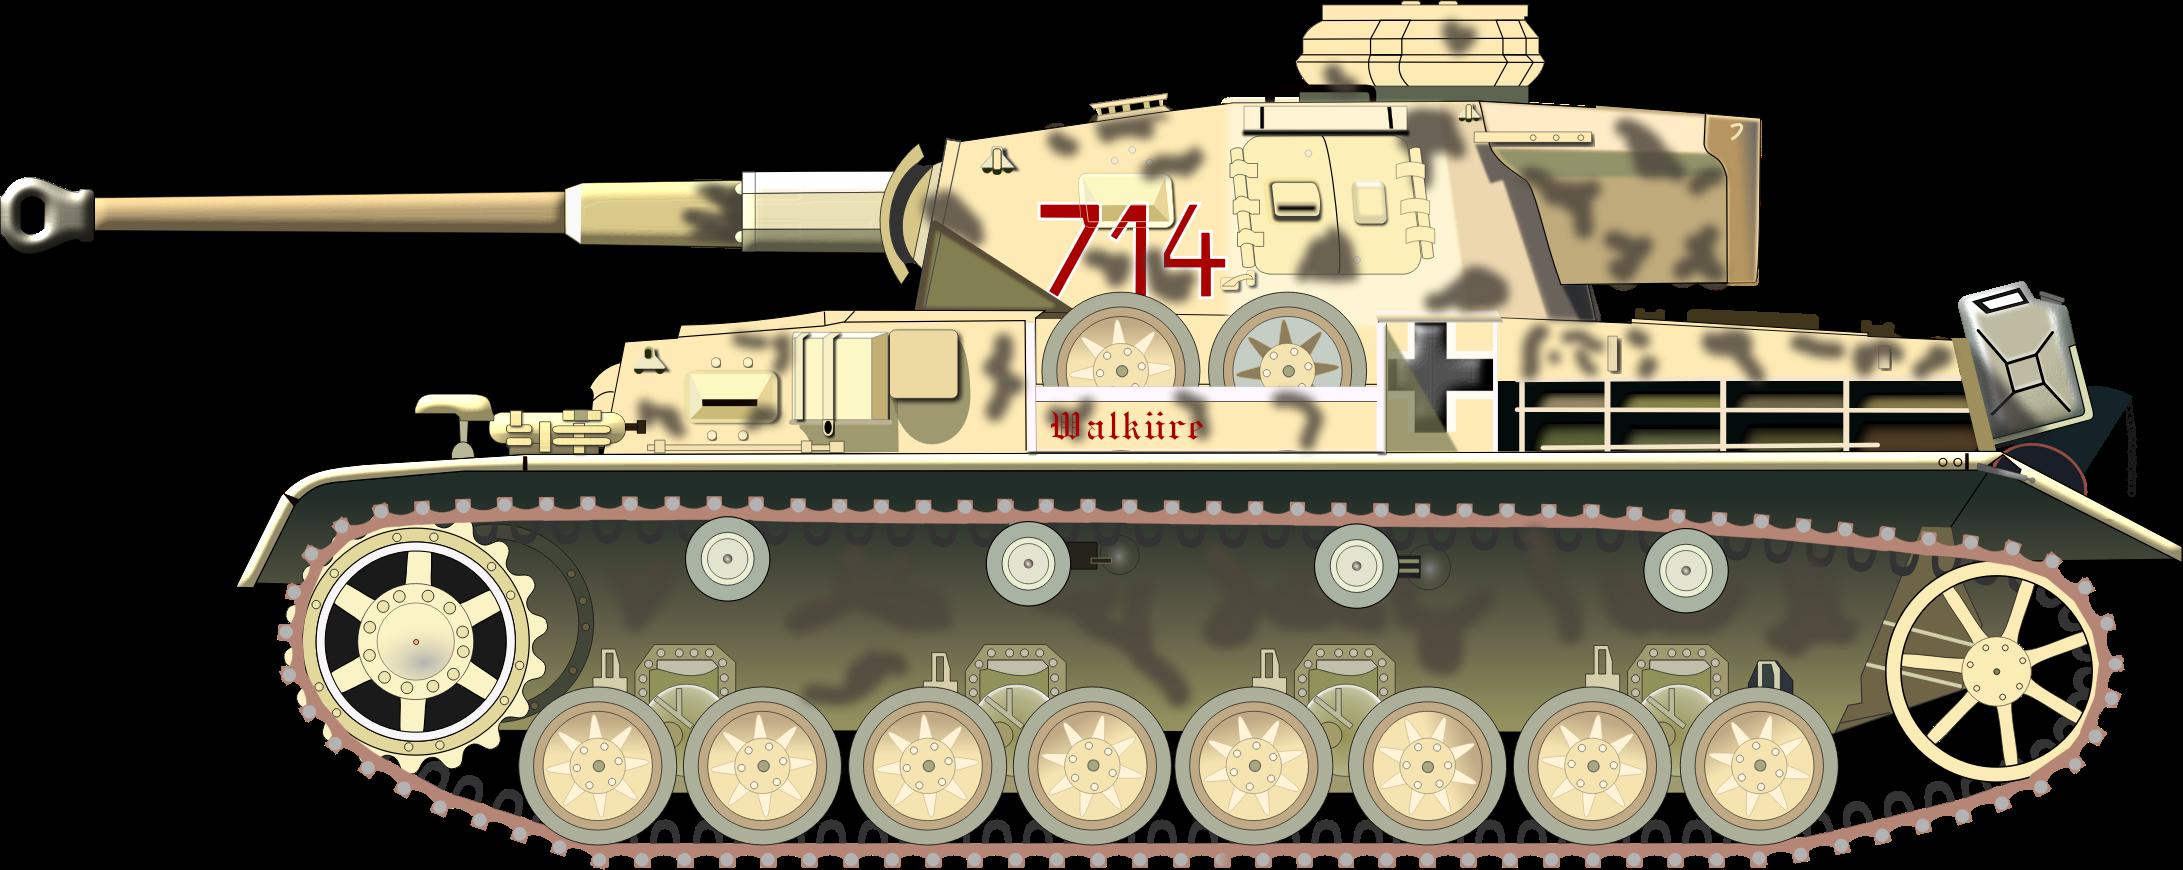 Military clipart turret. Panzer tank big image